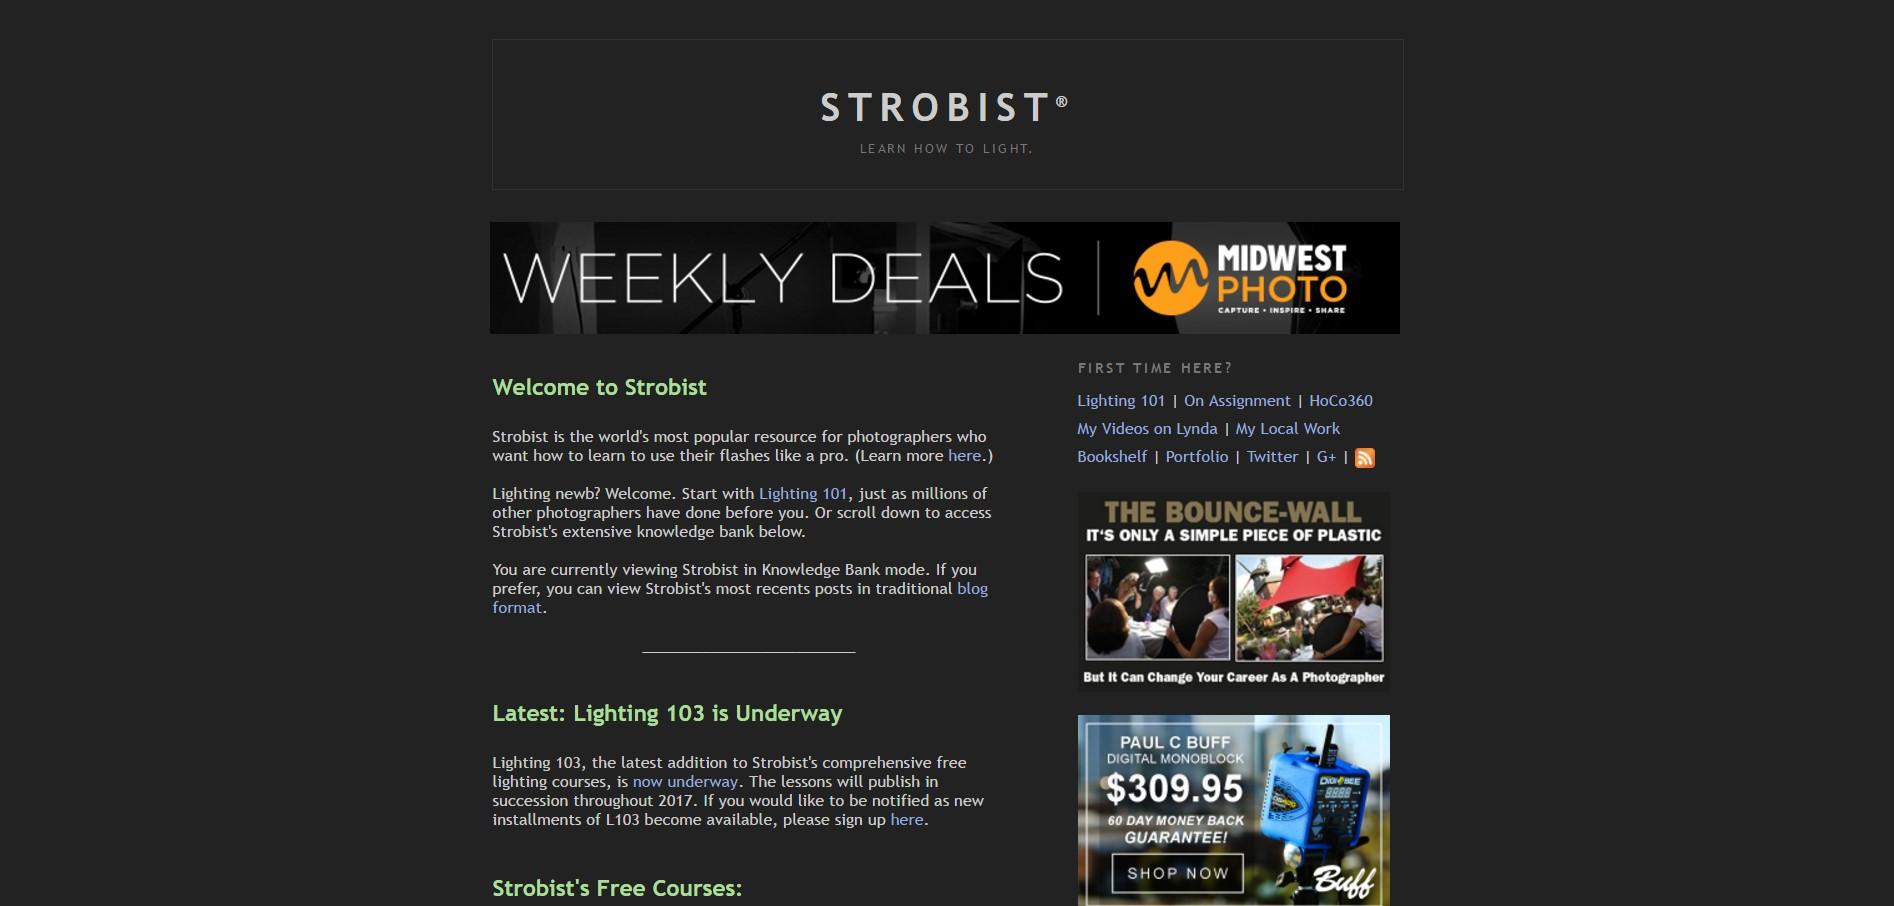 strobist_site